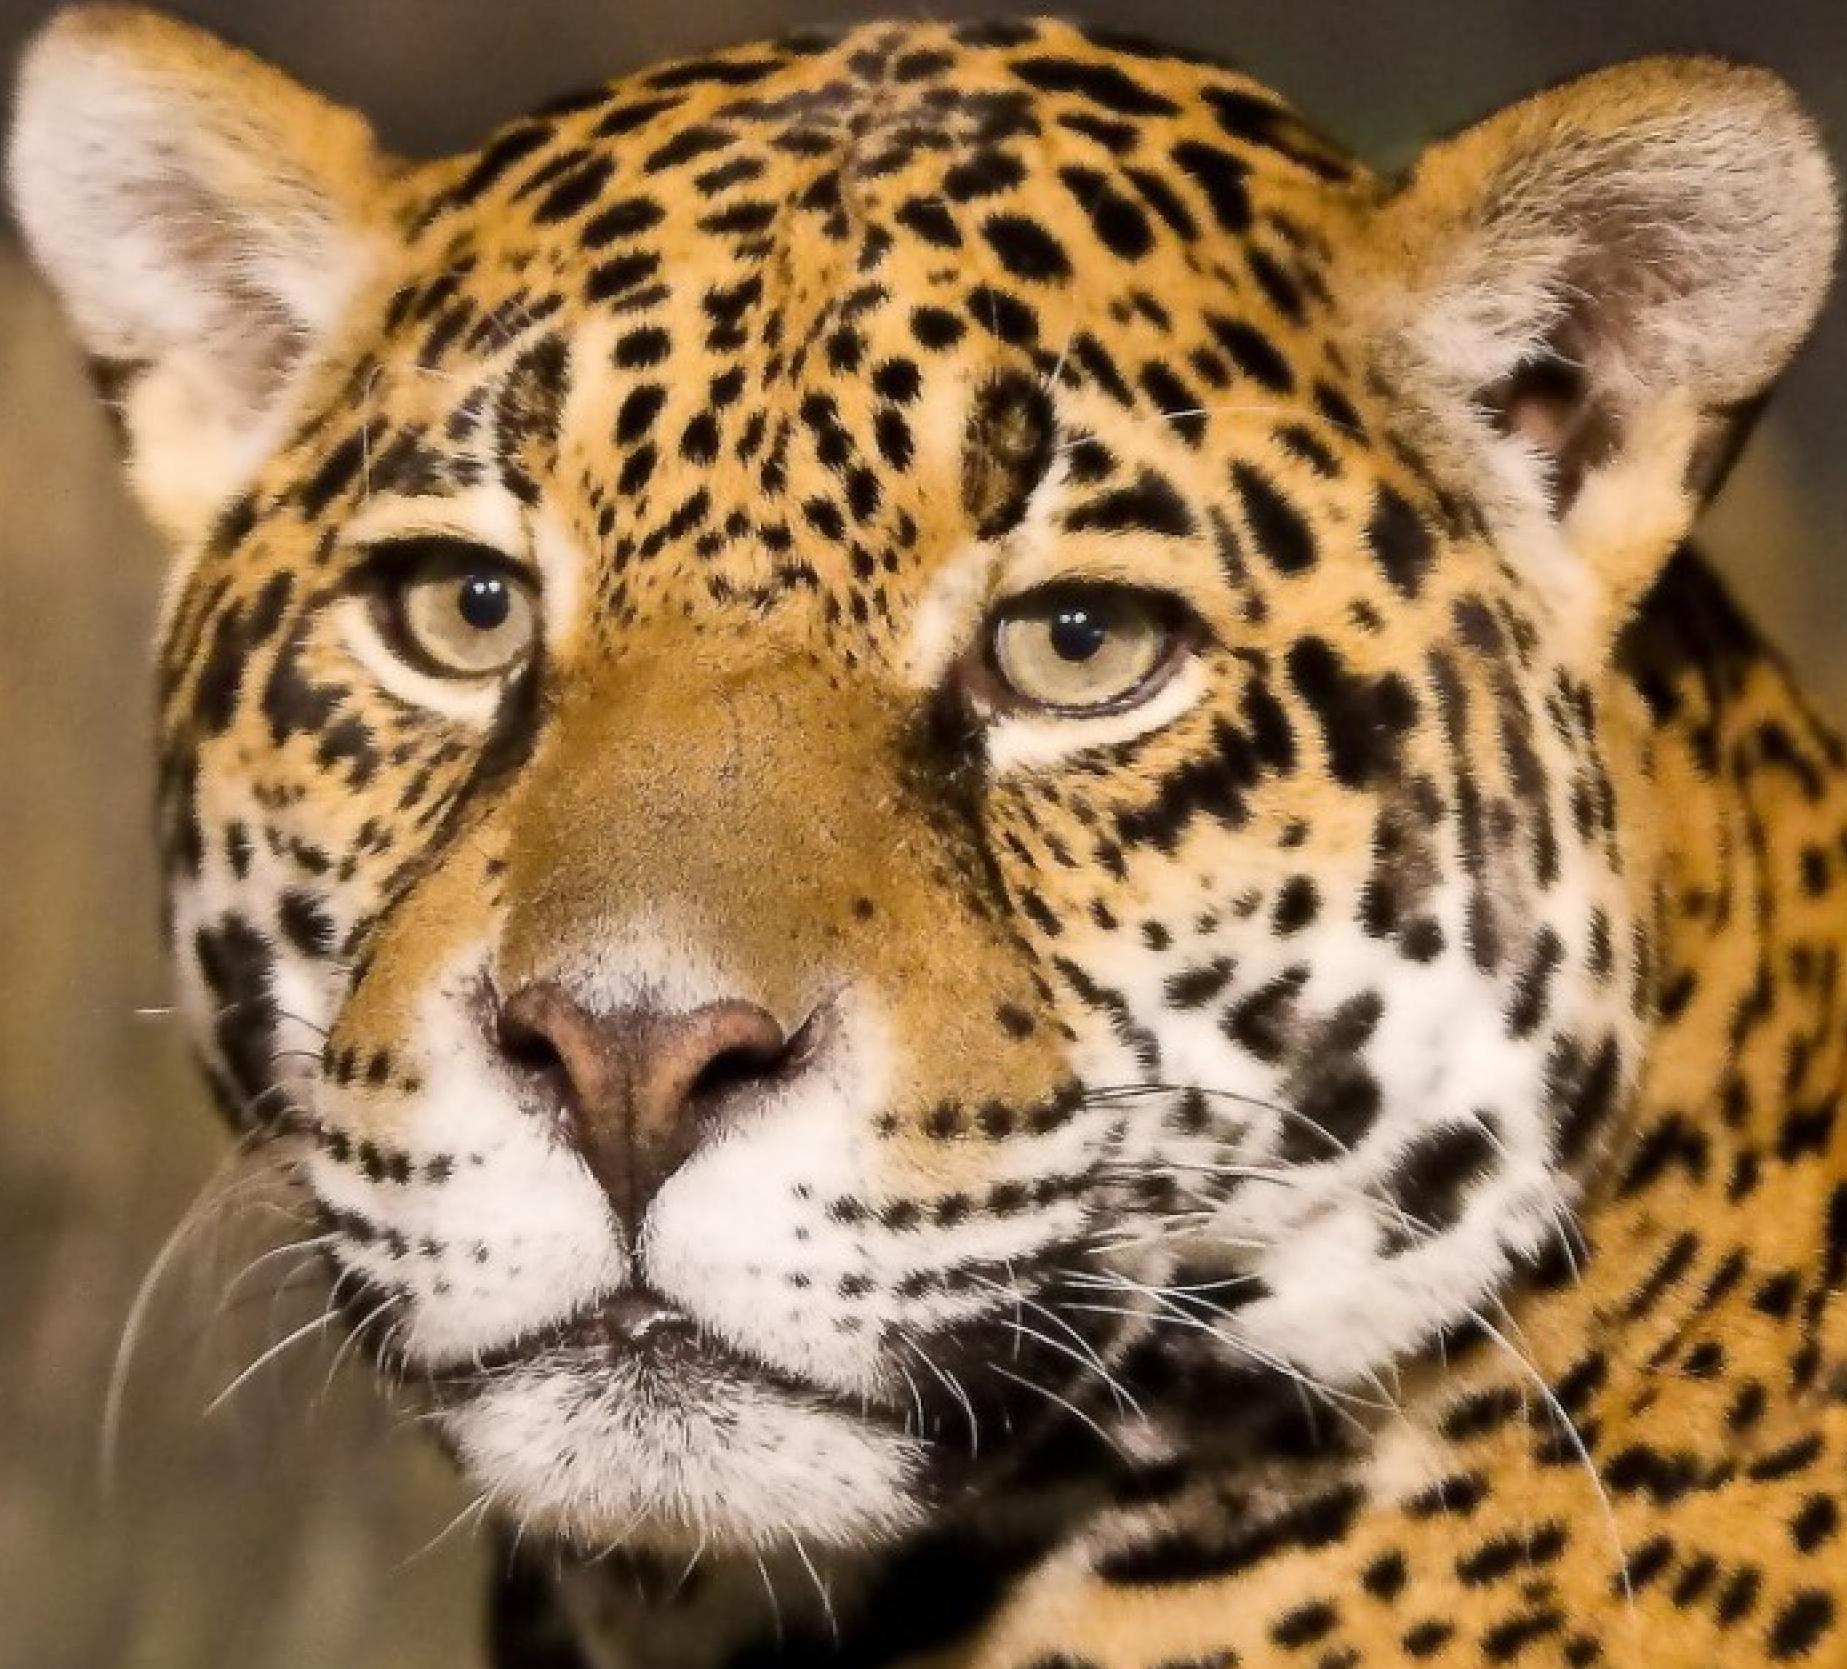 Lion Tiger Leopard Jaguar Lions Big Cats Tigers Leopards Jaguars